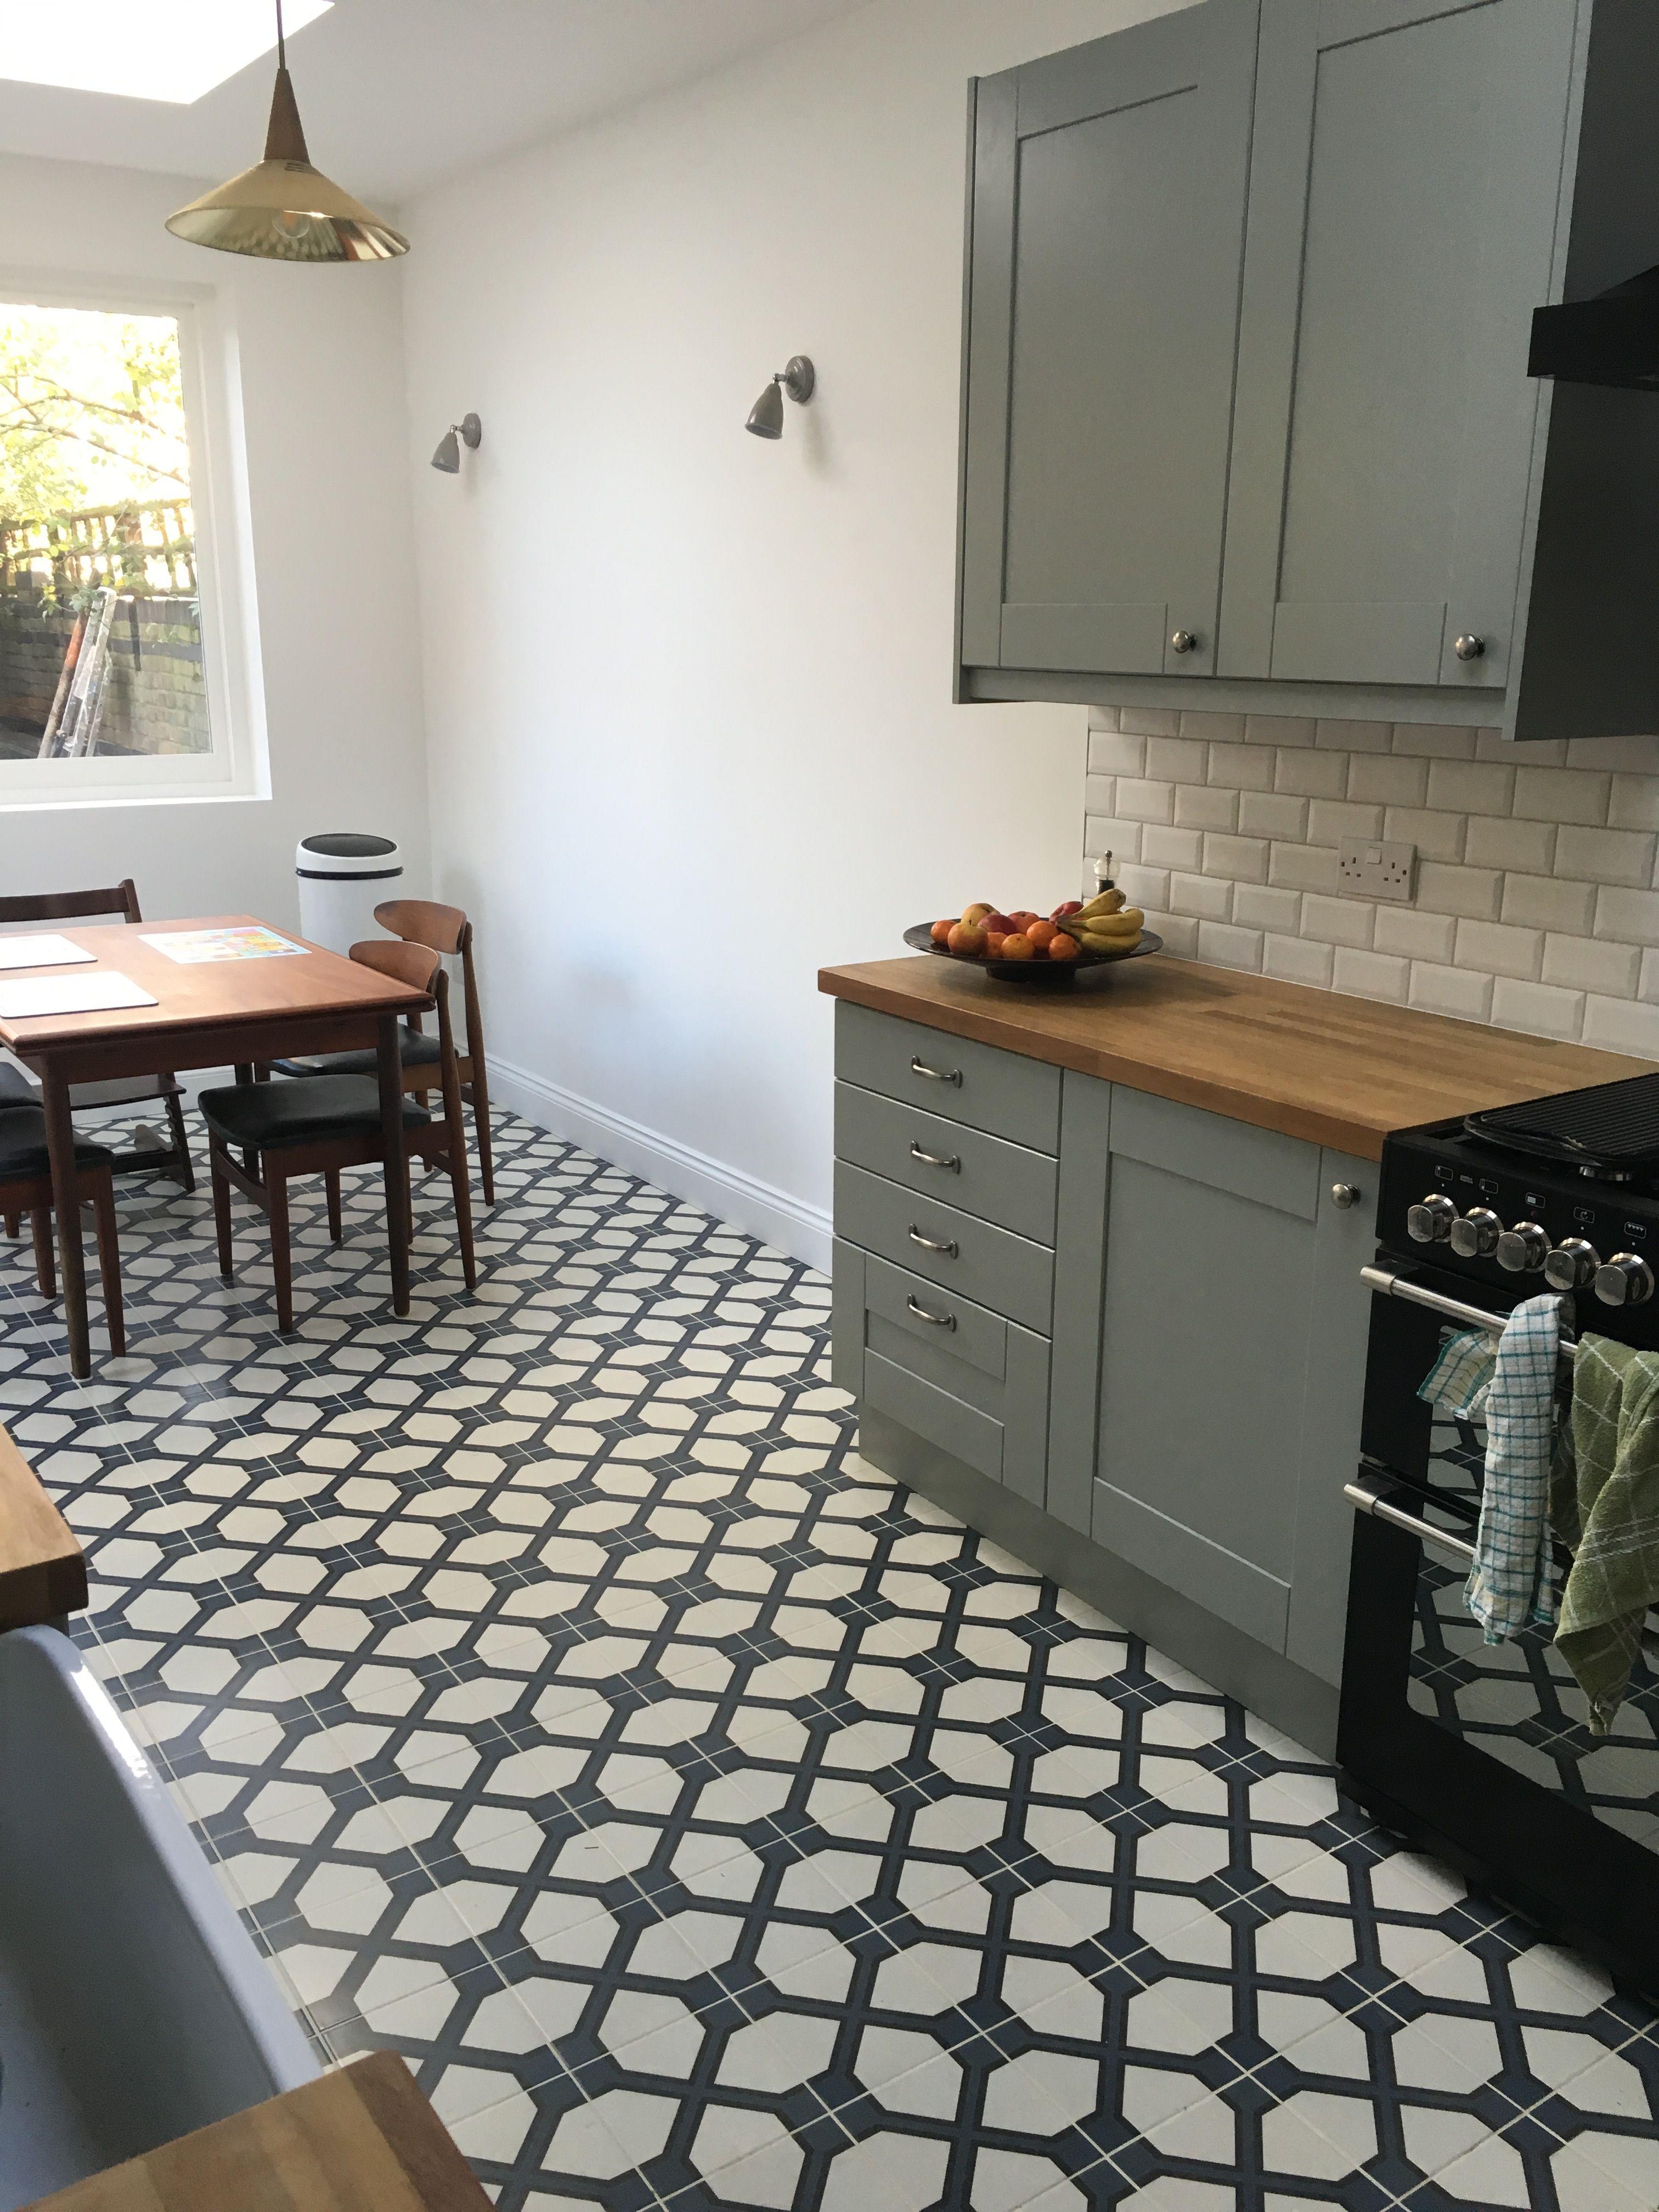 Diy Kitchens Linwood Lamproom Grey Units Fired Earth Trellis Lattice Floor Tiles Kitchen Tile Inspiration Trendy Kitchen Tile Trendy Bathroom Tiles